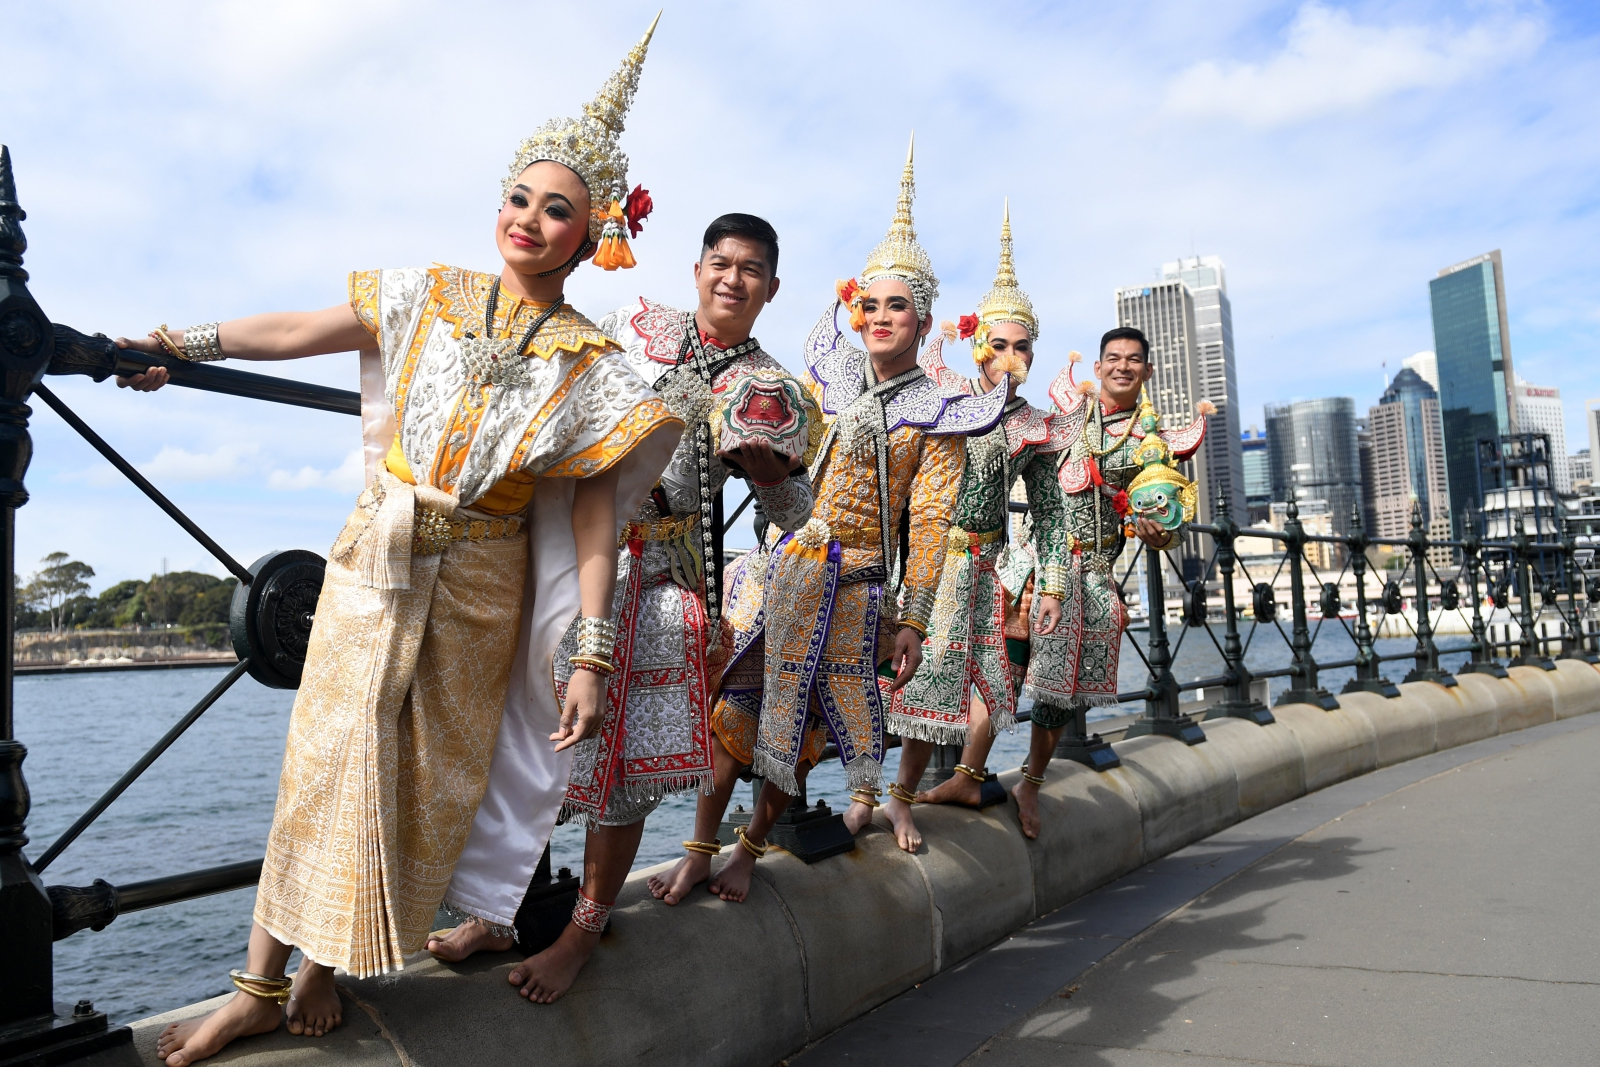 Teatr w Tajlandii  EPA/PAUL MILLER  AUSTRALIA AND NEW ZEALAND OUT